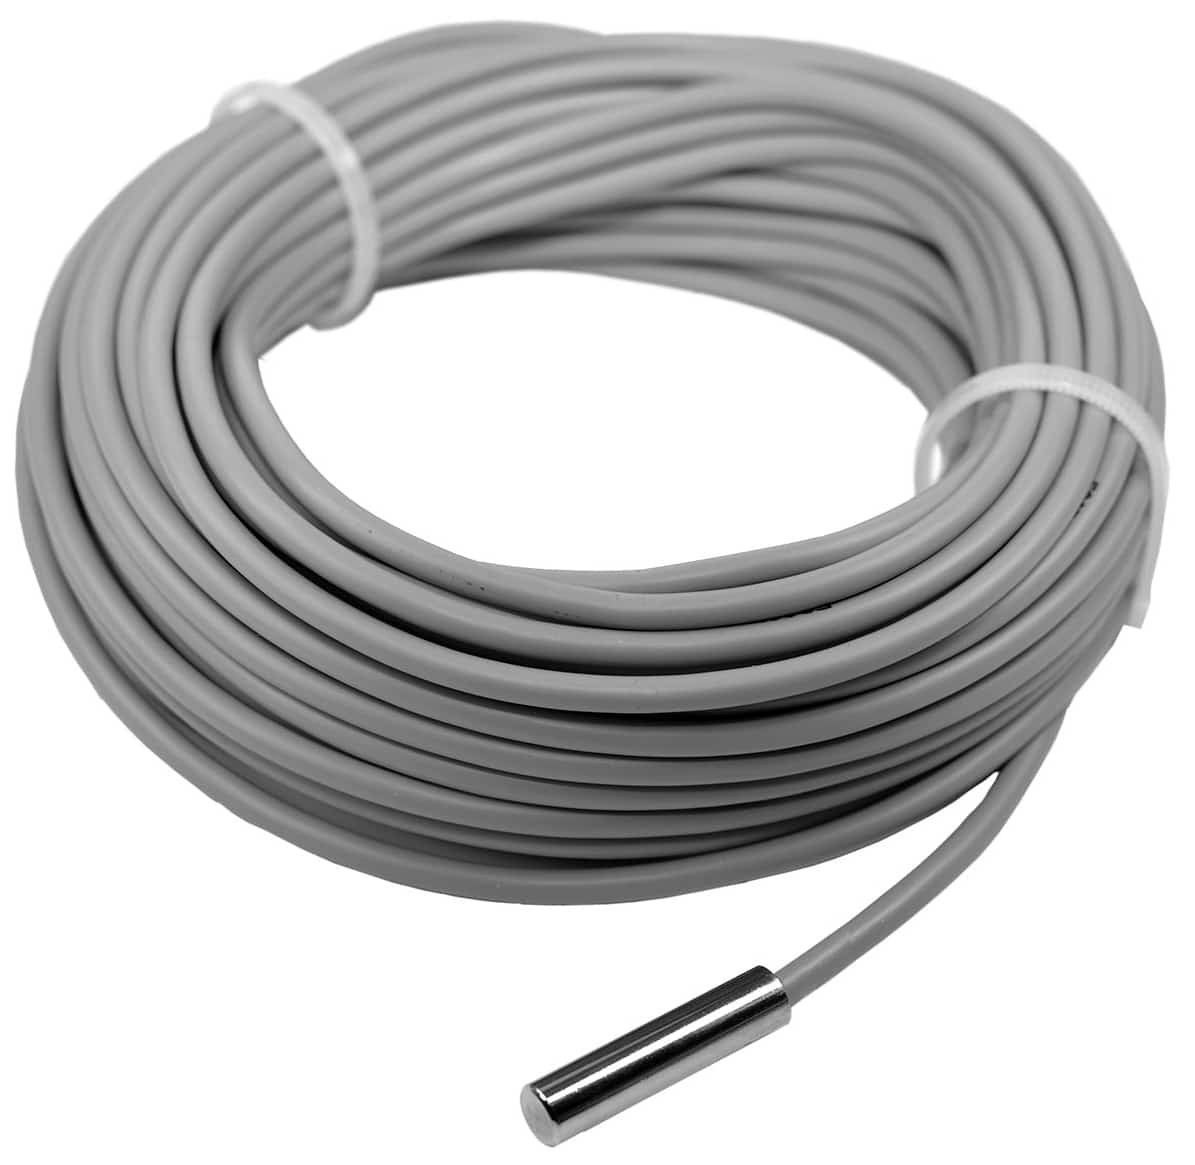 1-Wire wasserfester Temperatur-Sensor